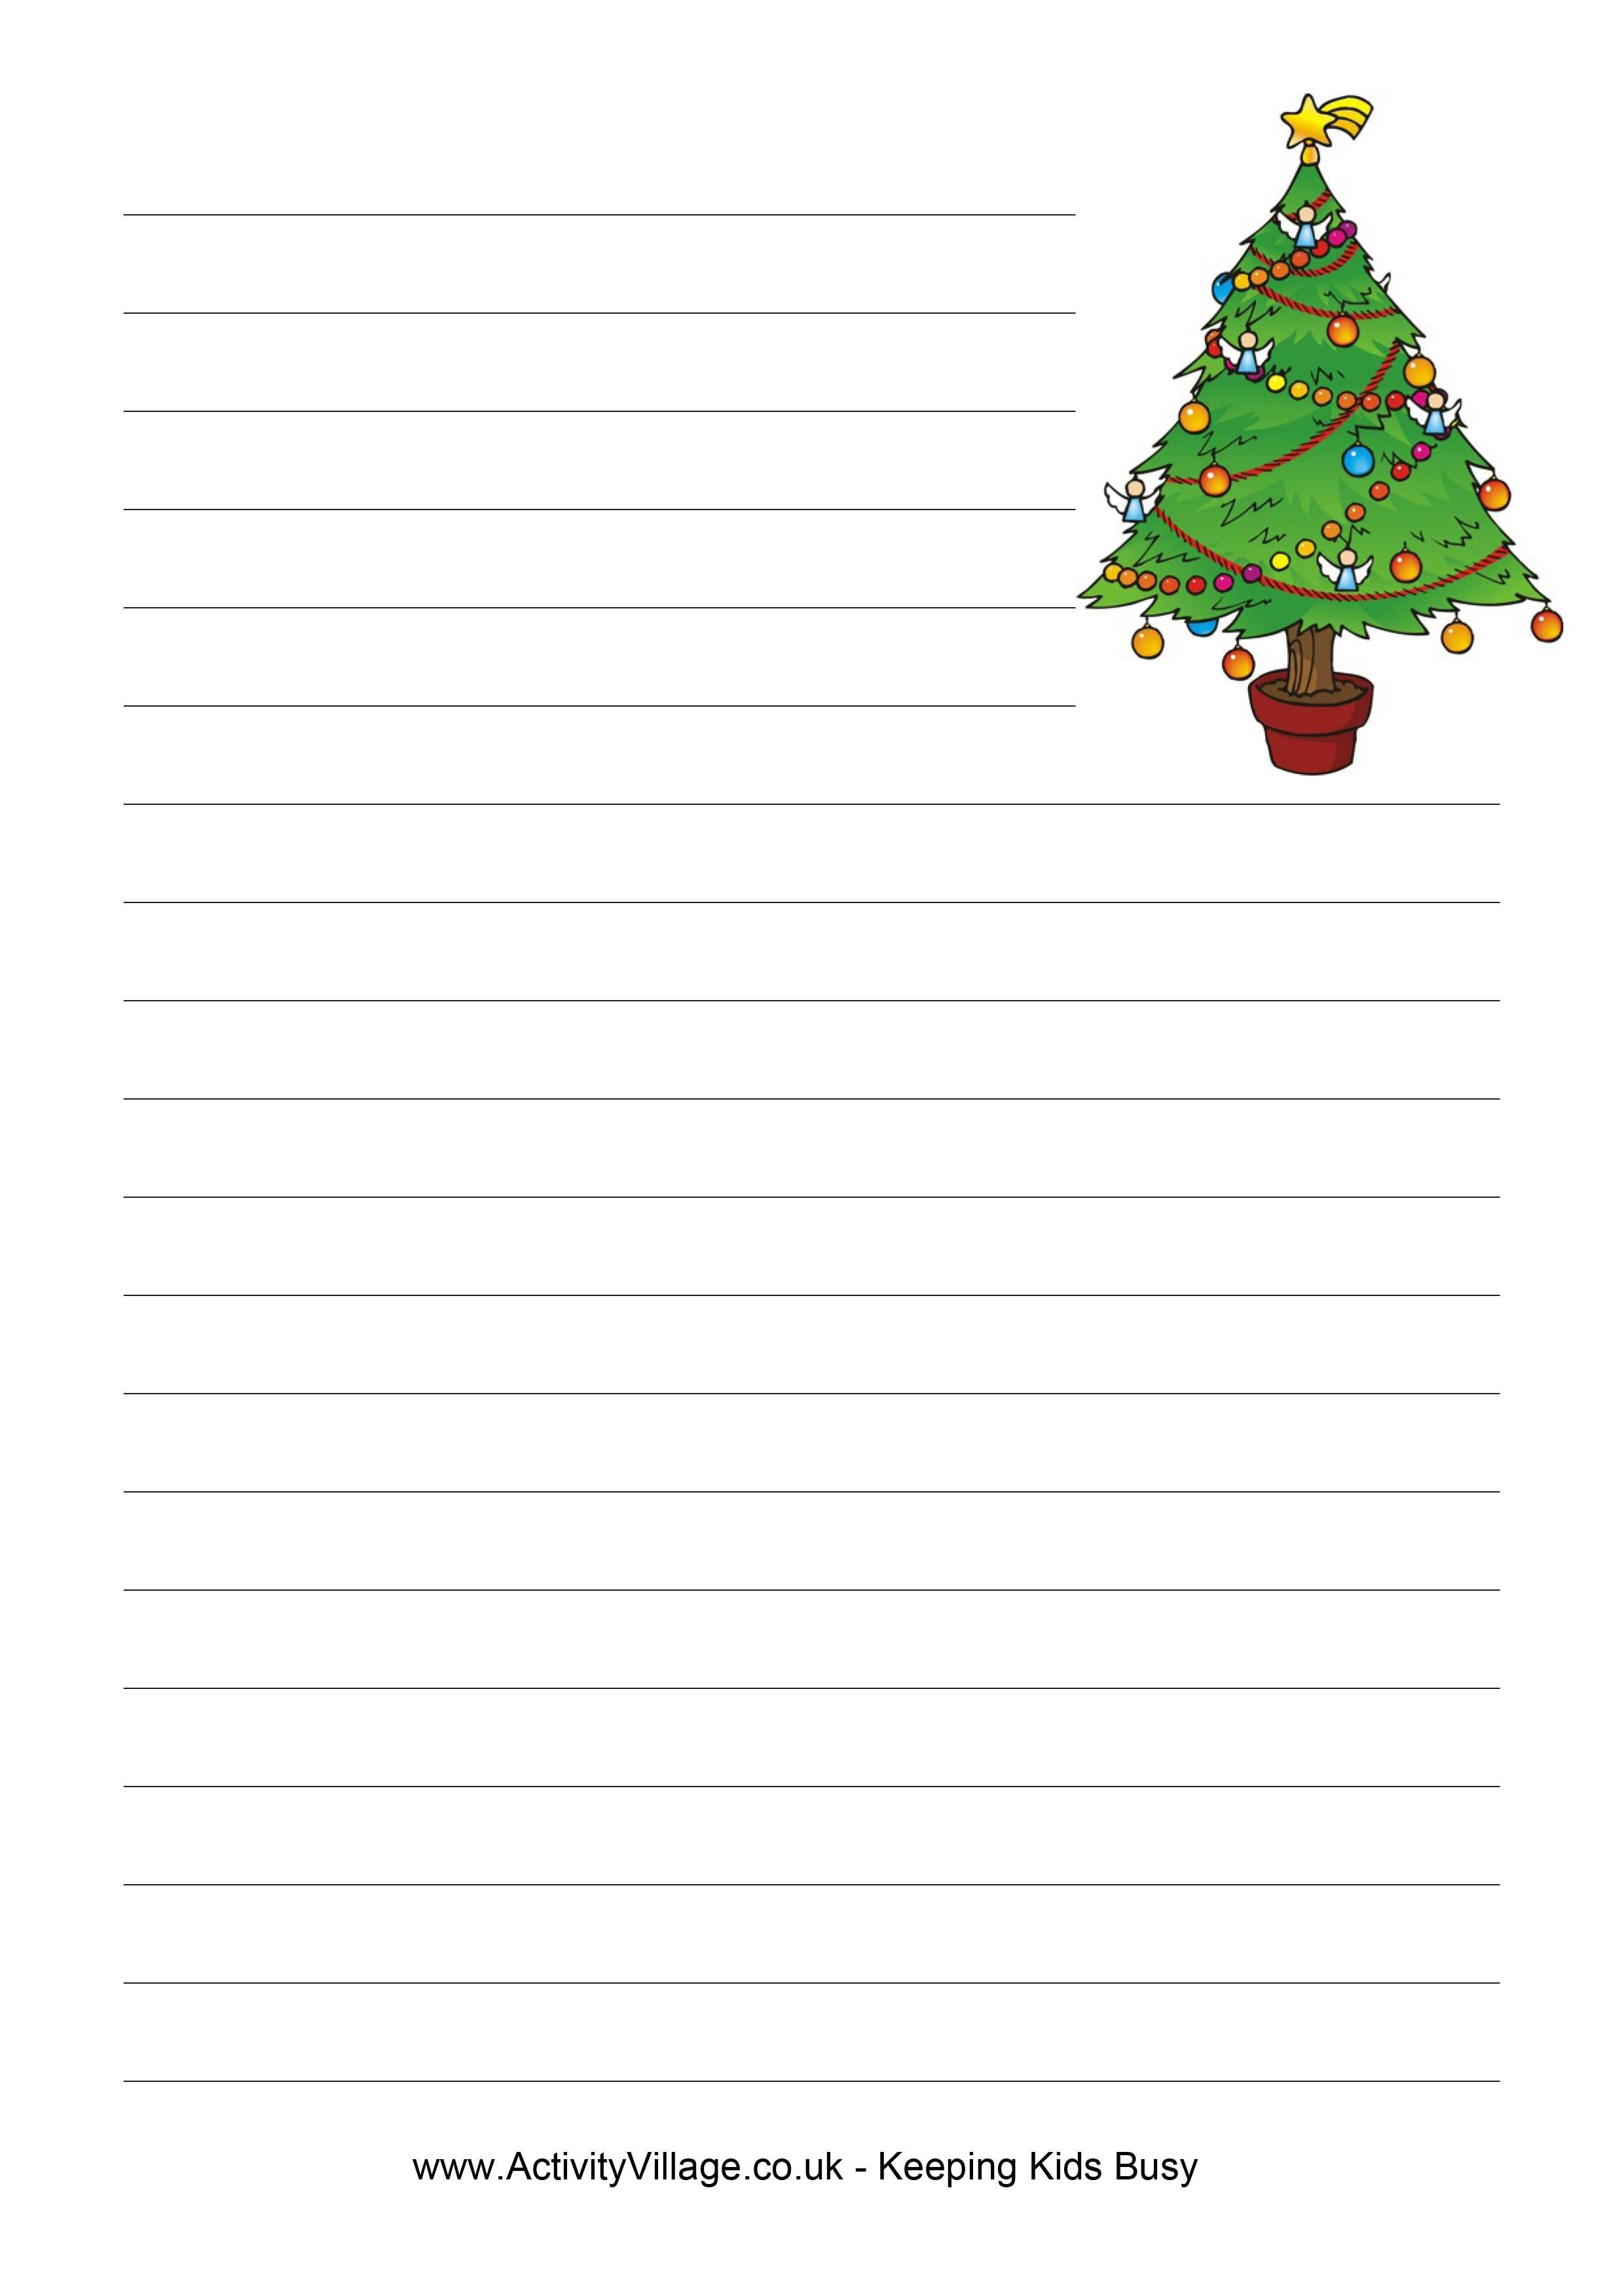 Beginning Writer Lined Paper